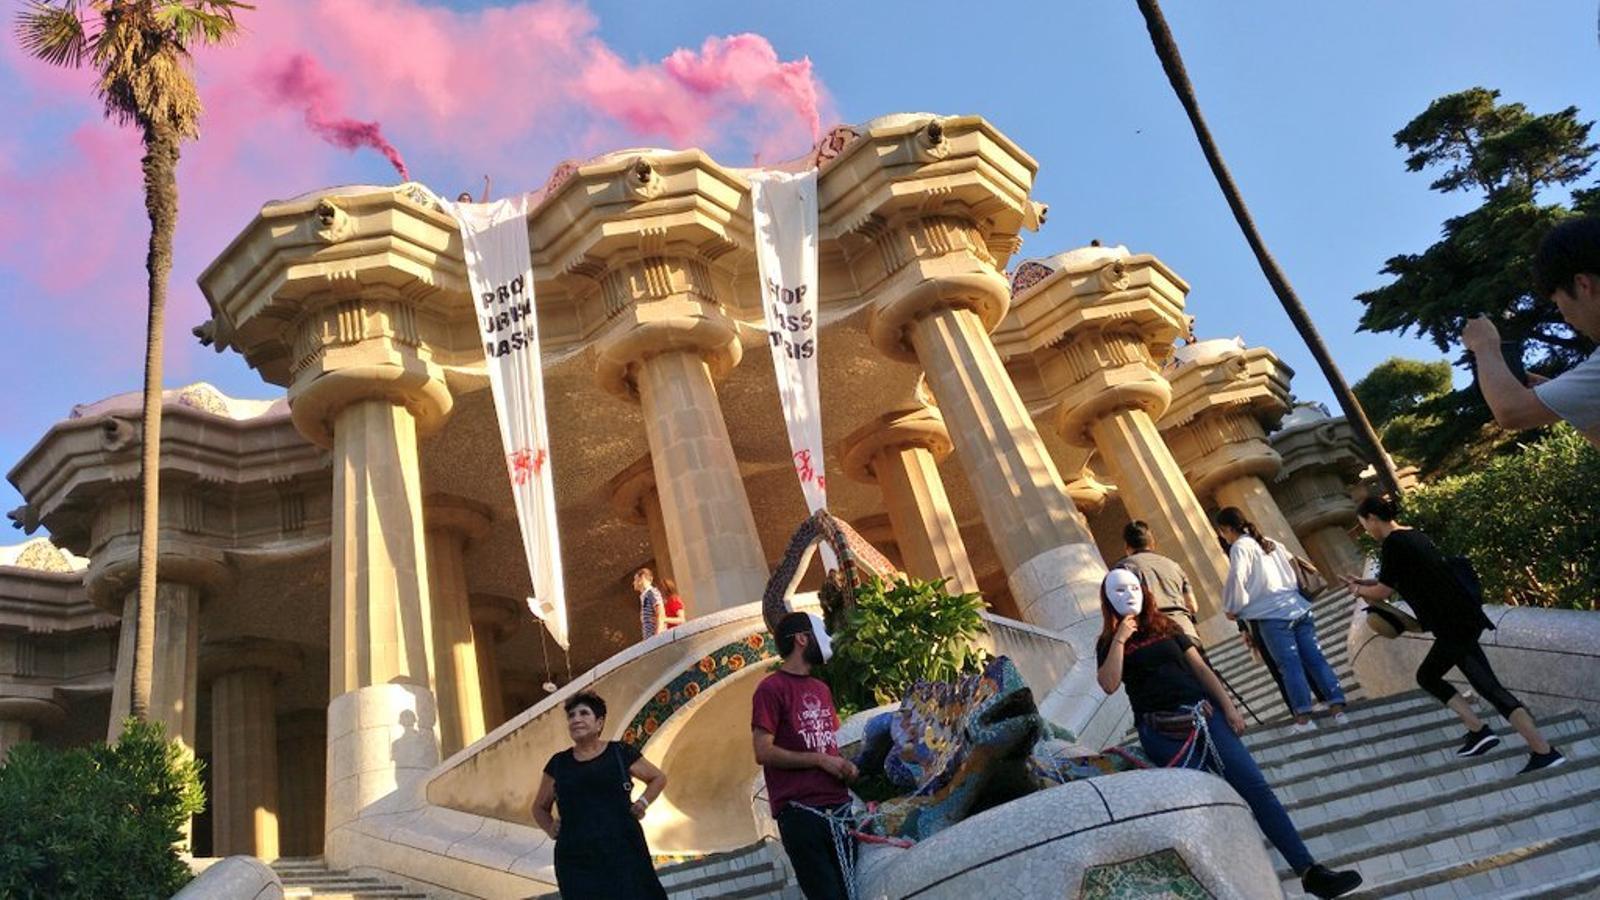 Joves d'Arran s'encadenen al drac del Parc Güell en protesta contra el model turístic